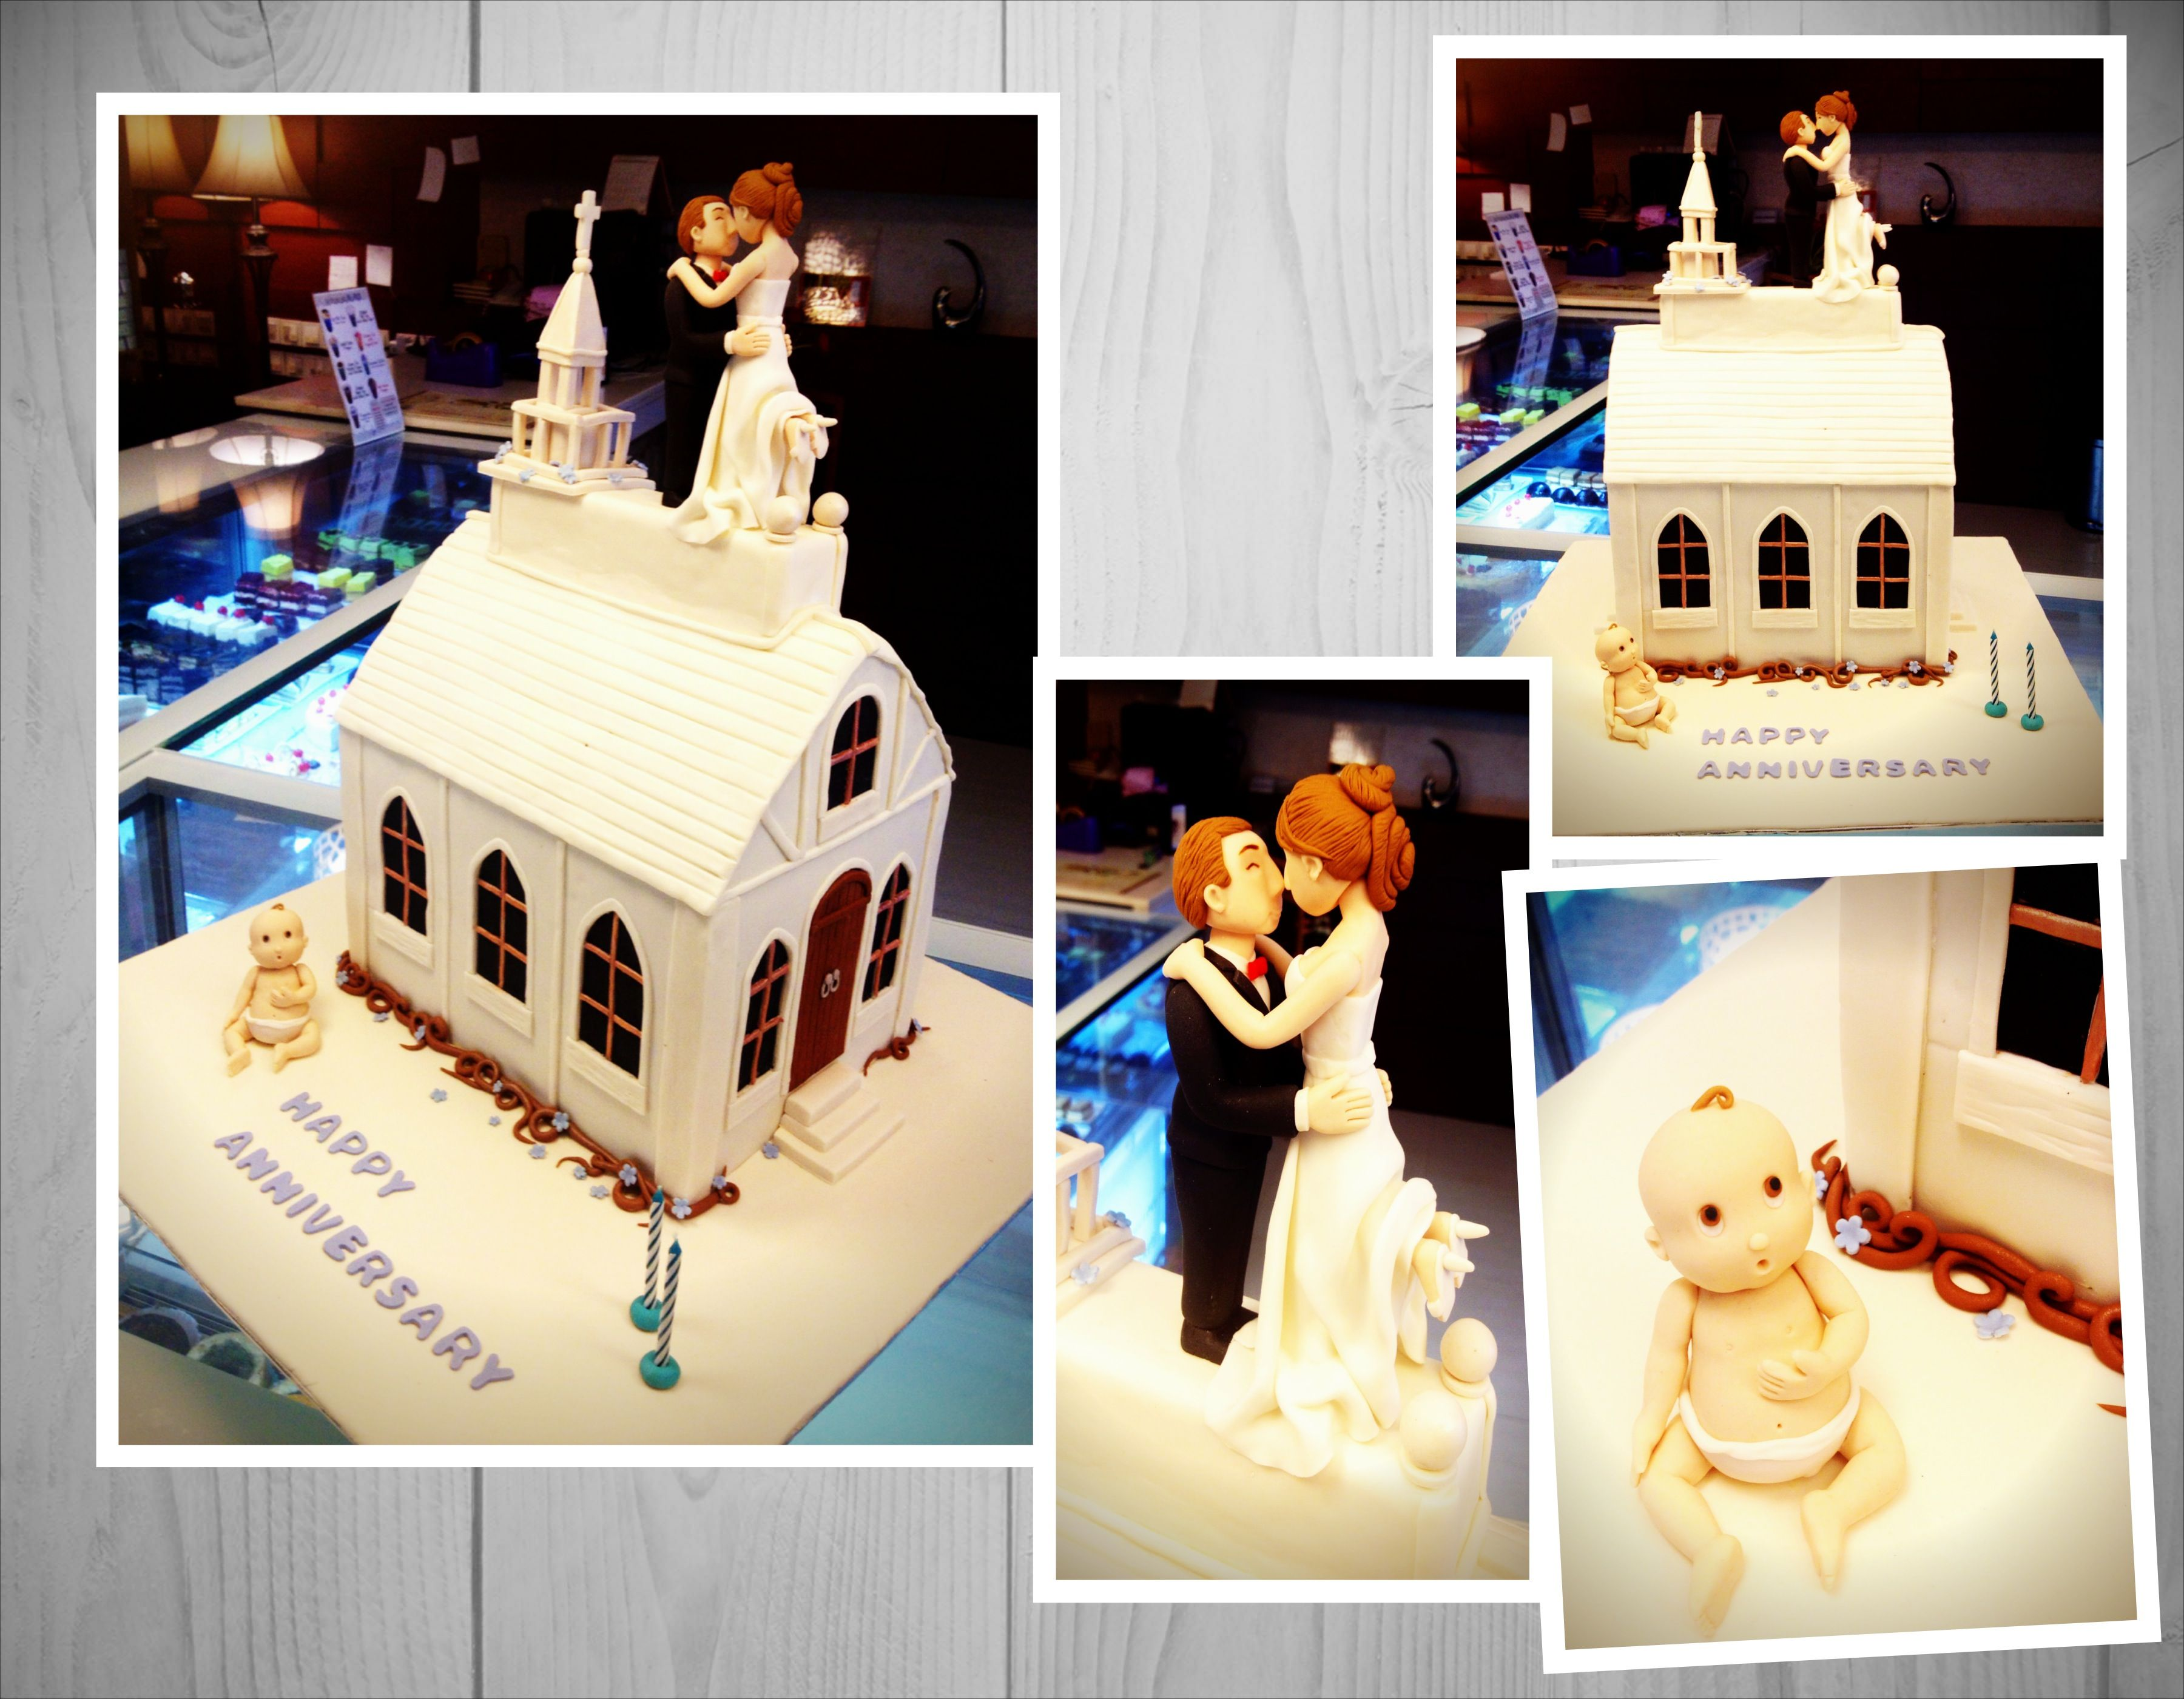 anniversary wedding cake (Dengan gambar)